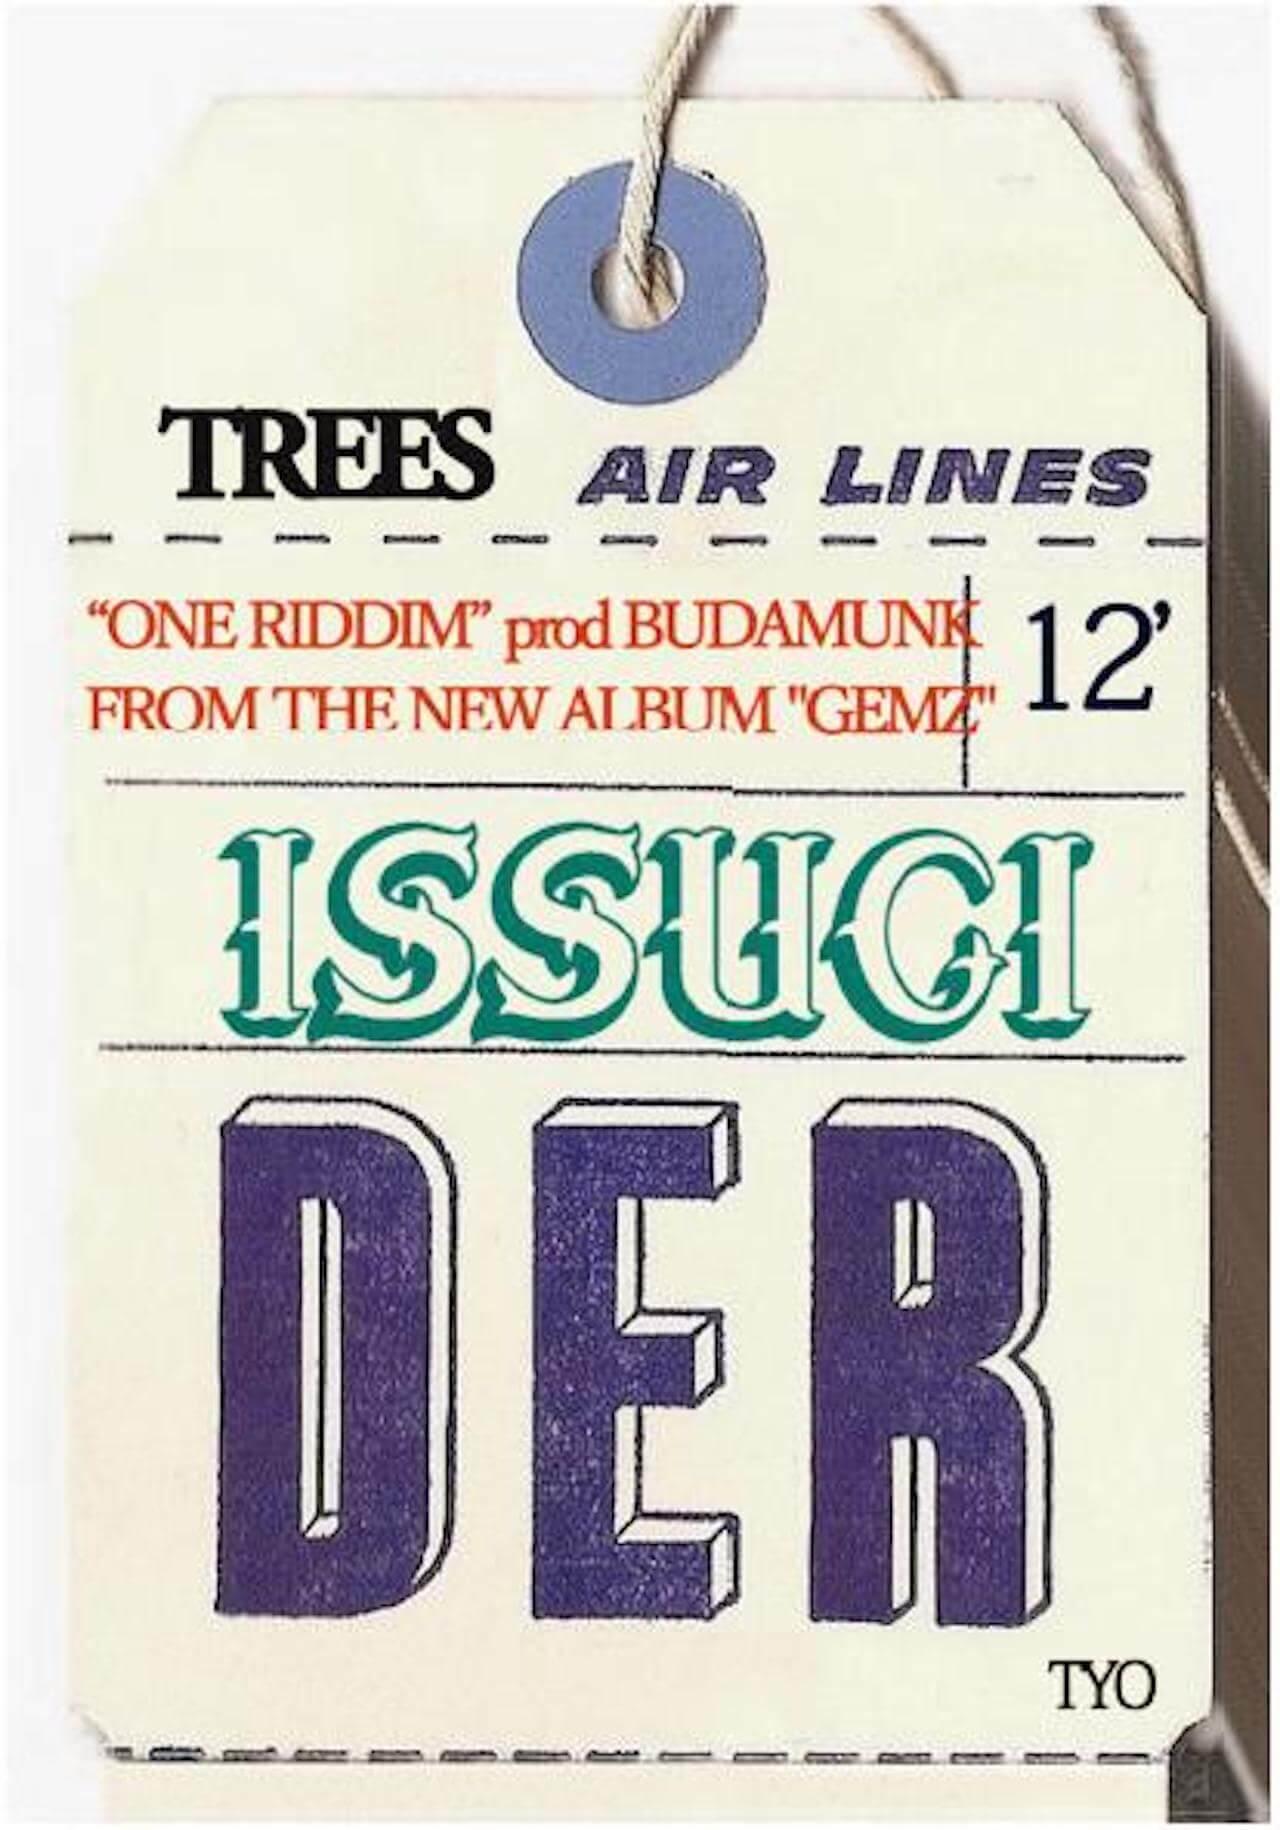 ISSUGI、待望のニュー・アルバム『GEMZ』が12月に発売|5lack、仙人掌、Mr.PUG、OYG、KOJOE、Devin Morrison、16FLIPが参加 music191024-issugi-2